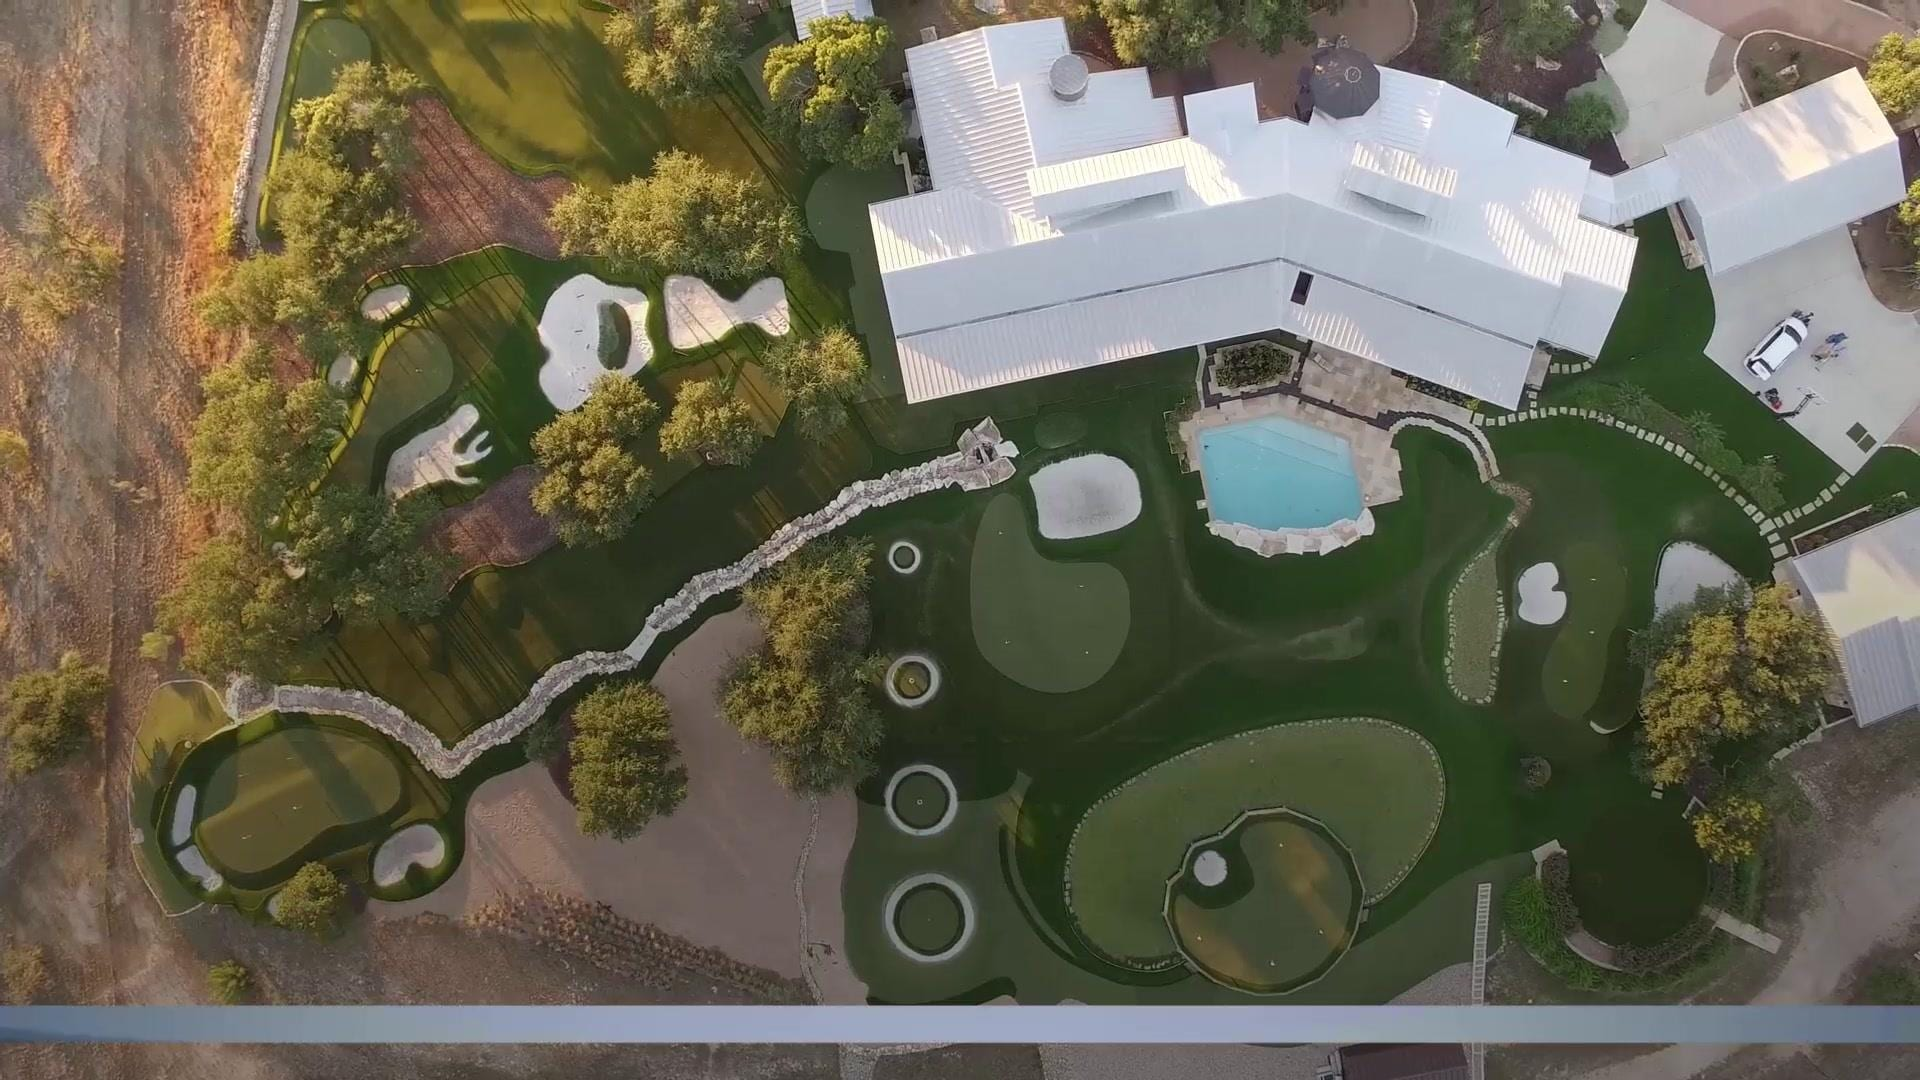 dave pelz u0027s backyard golf practice area in texas golf channel